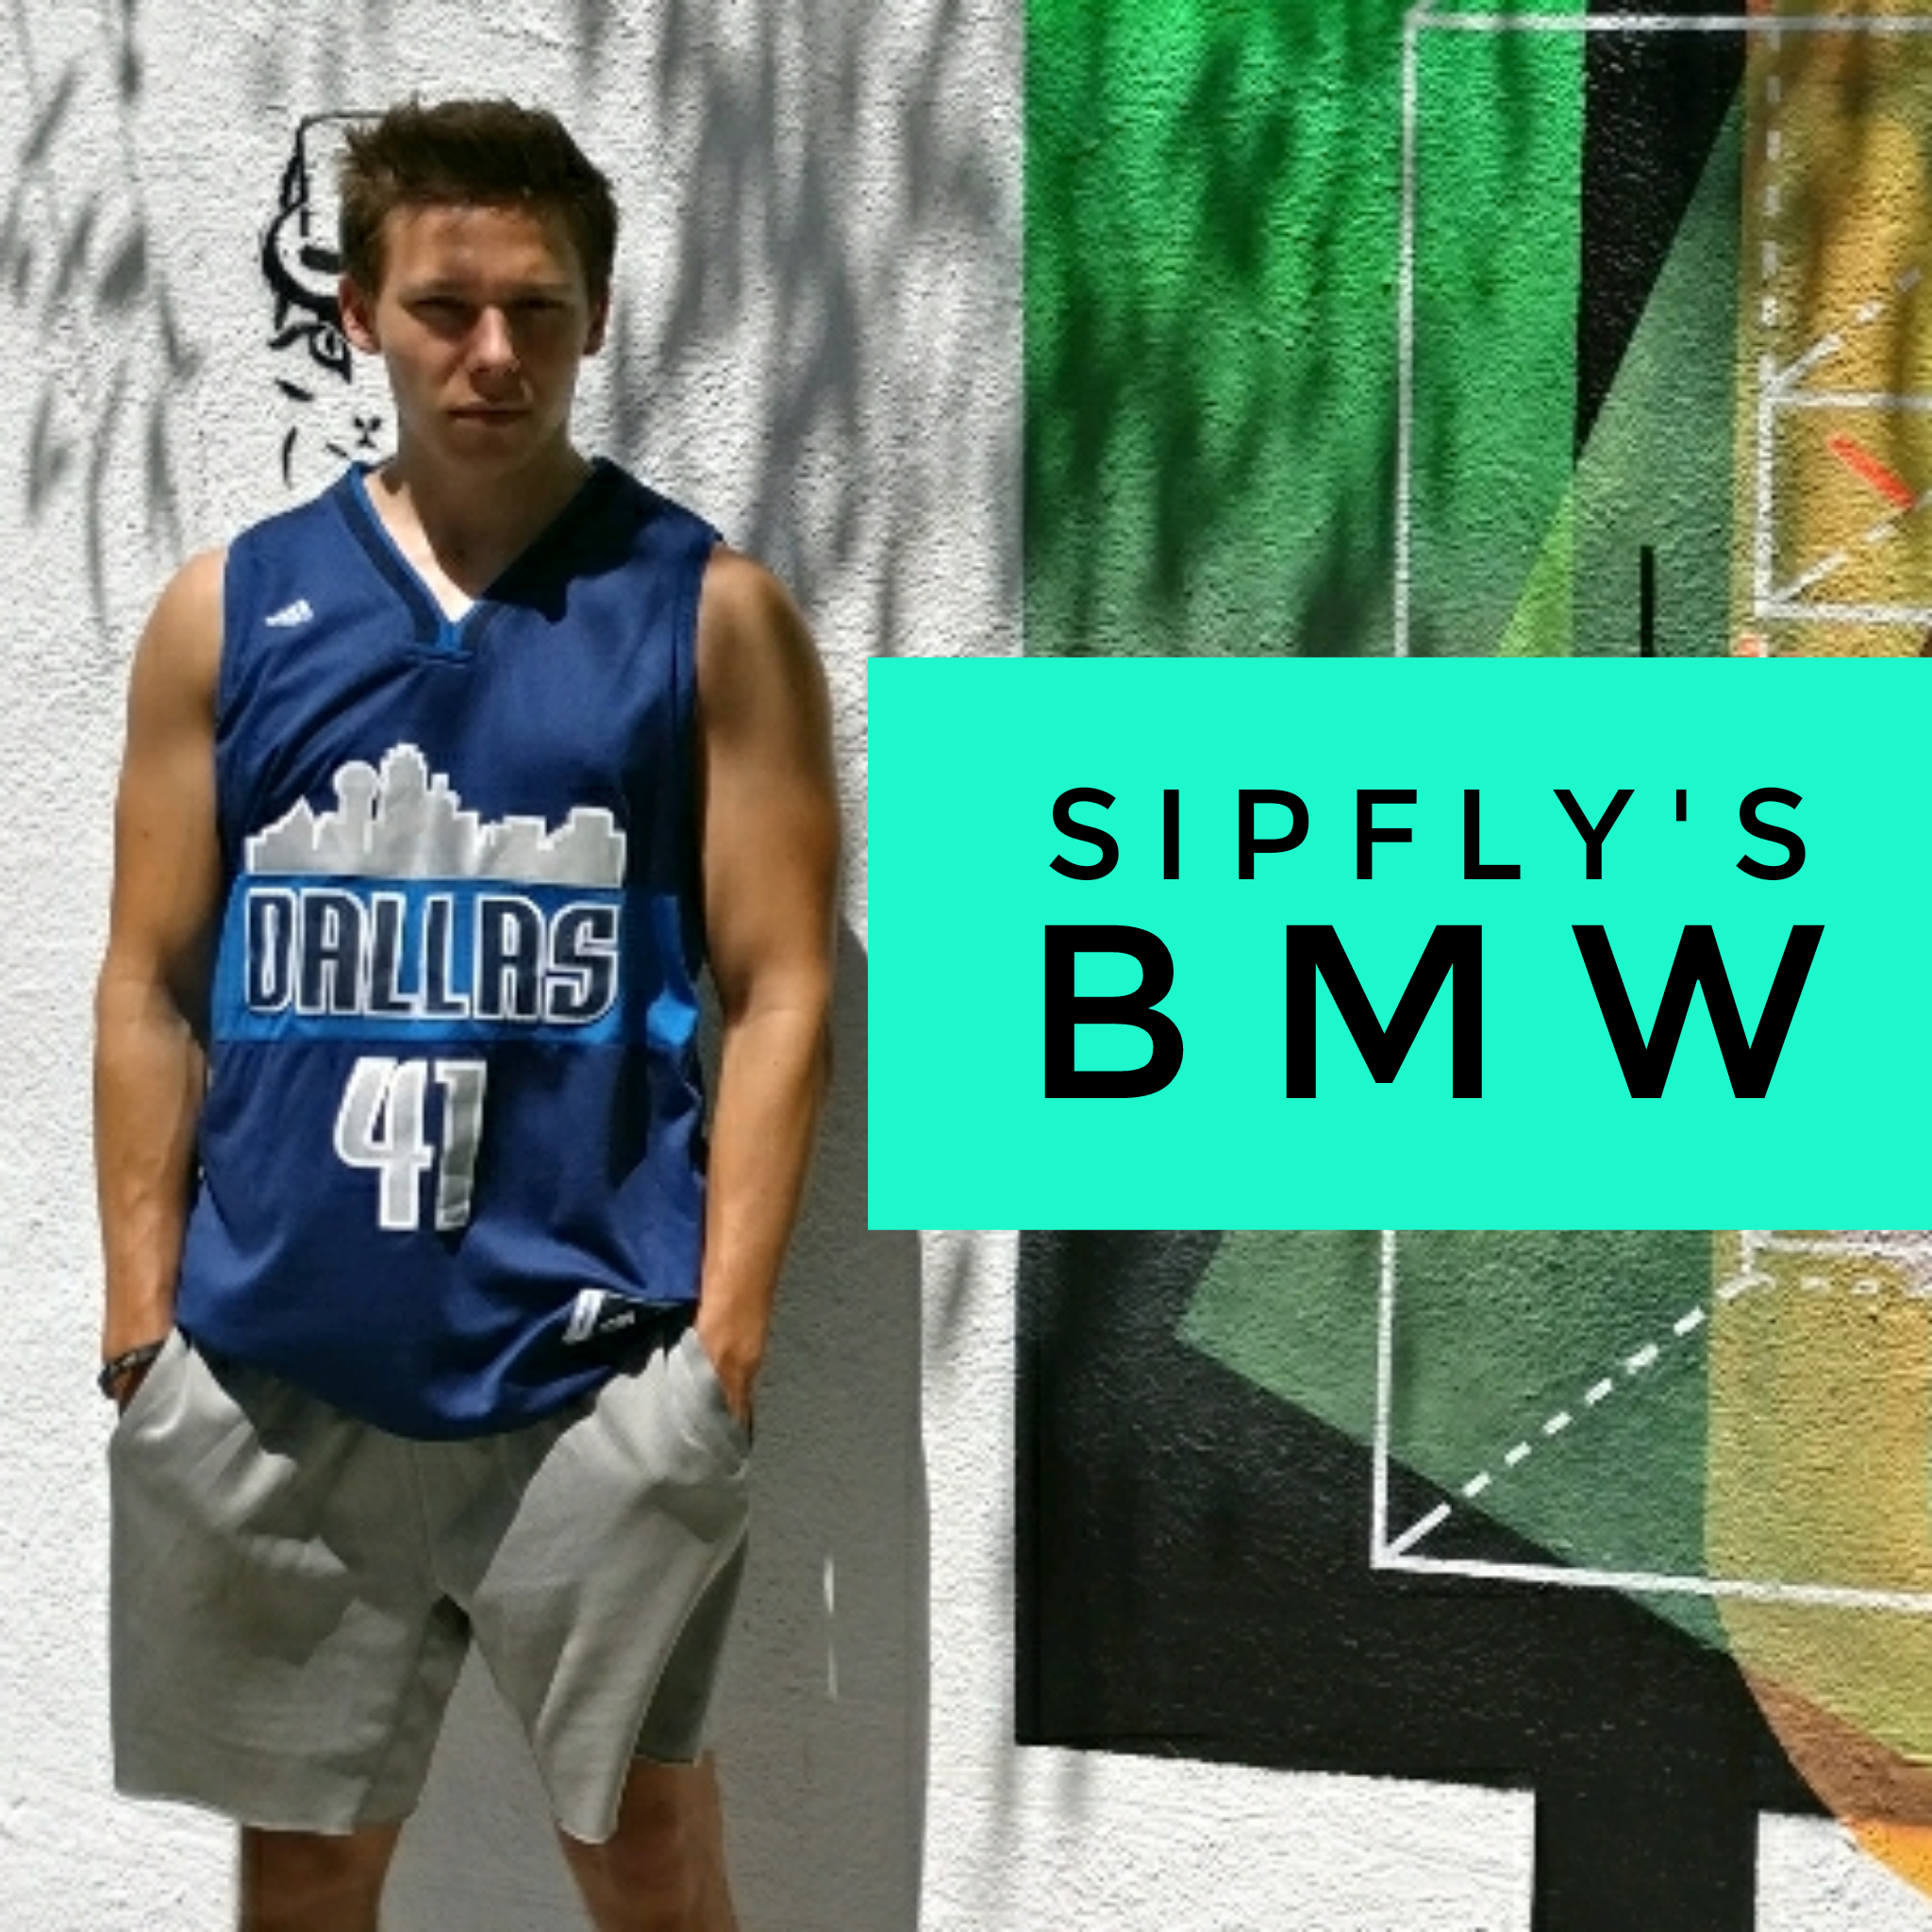 Sipfly's BMW